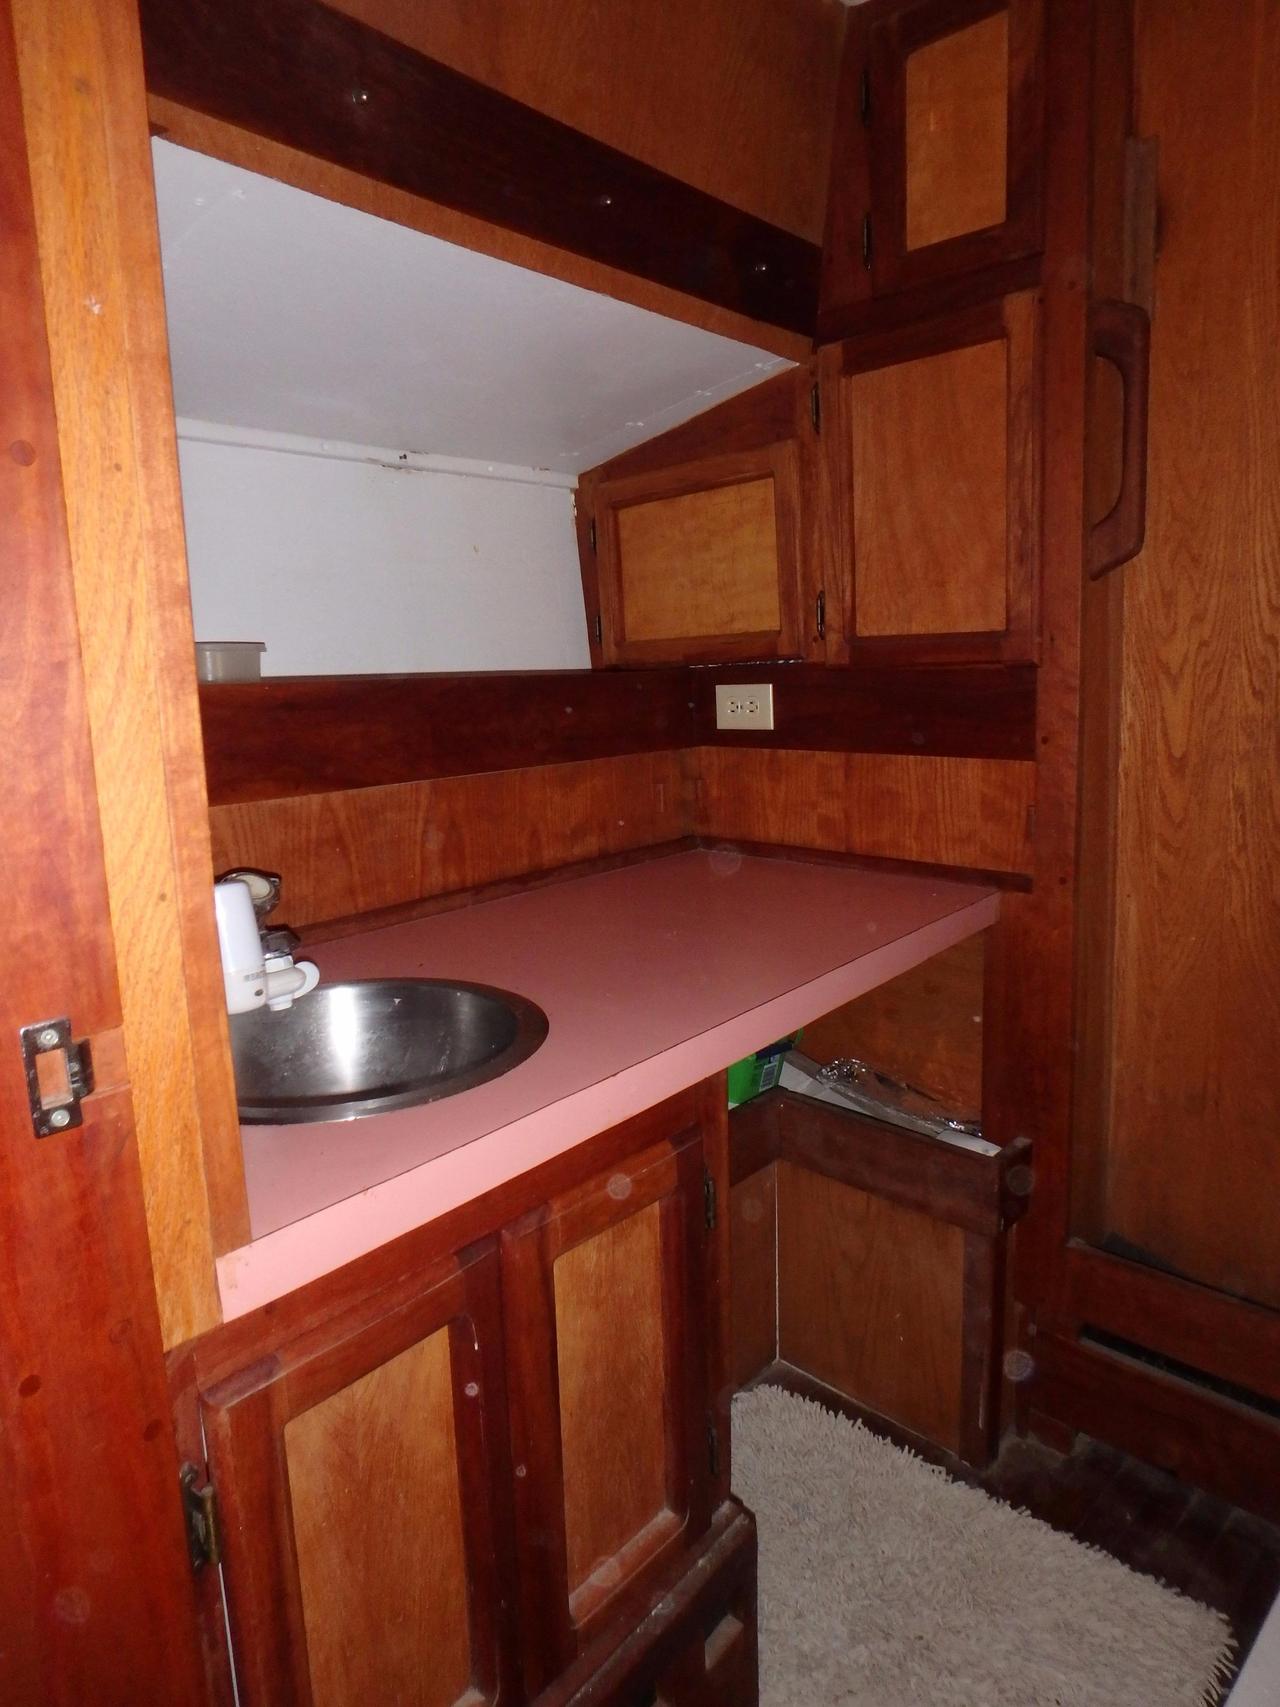 1986 Used Kanter 50 Cruiser Sailboat For Sale $90 000 San Carlos